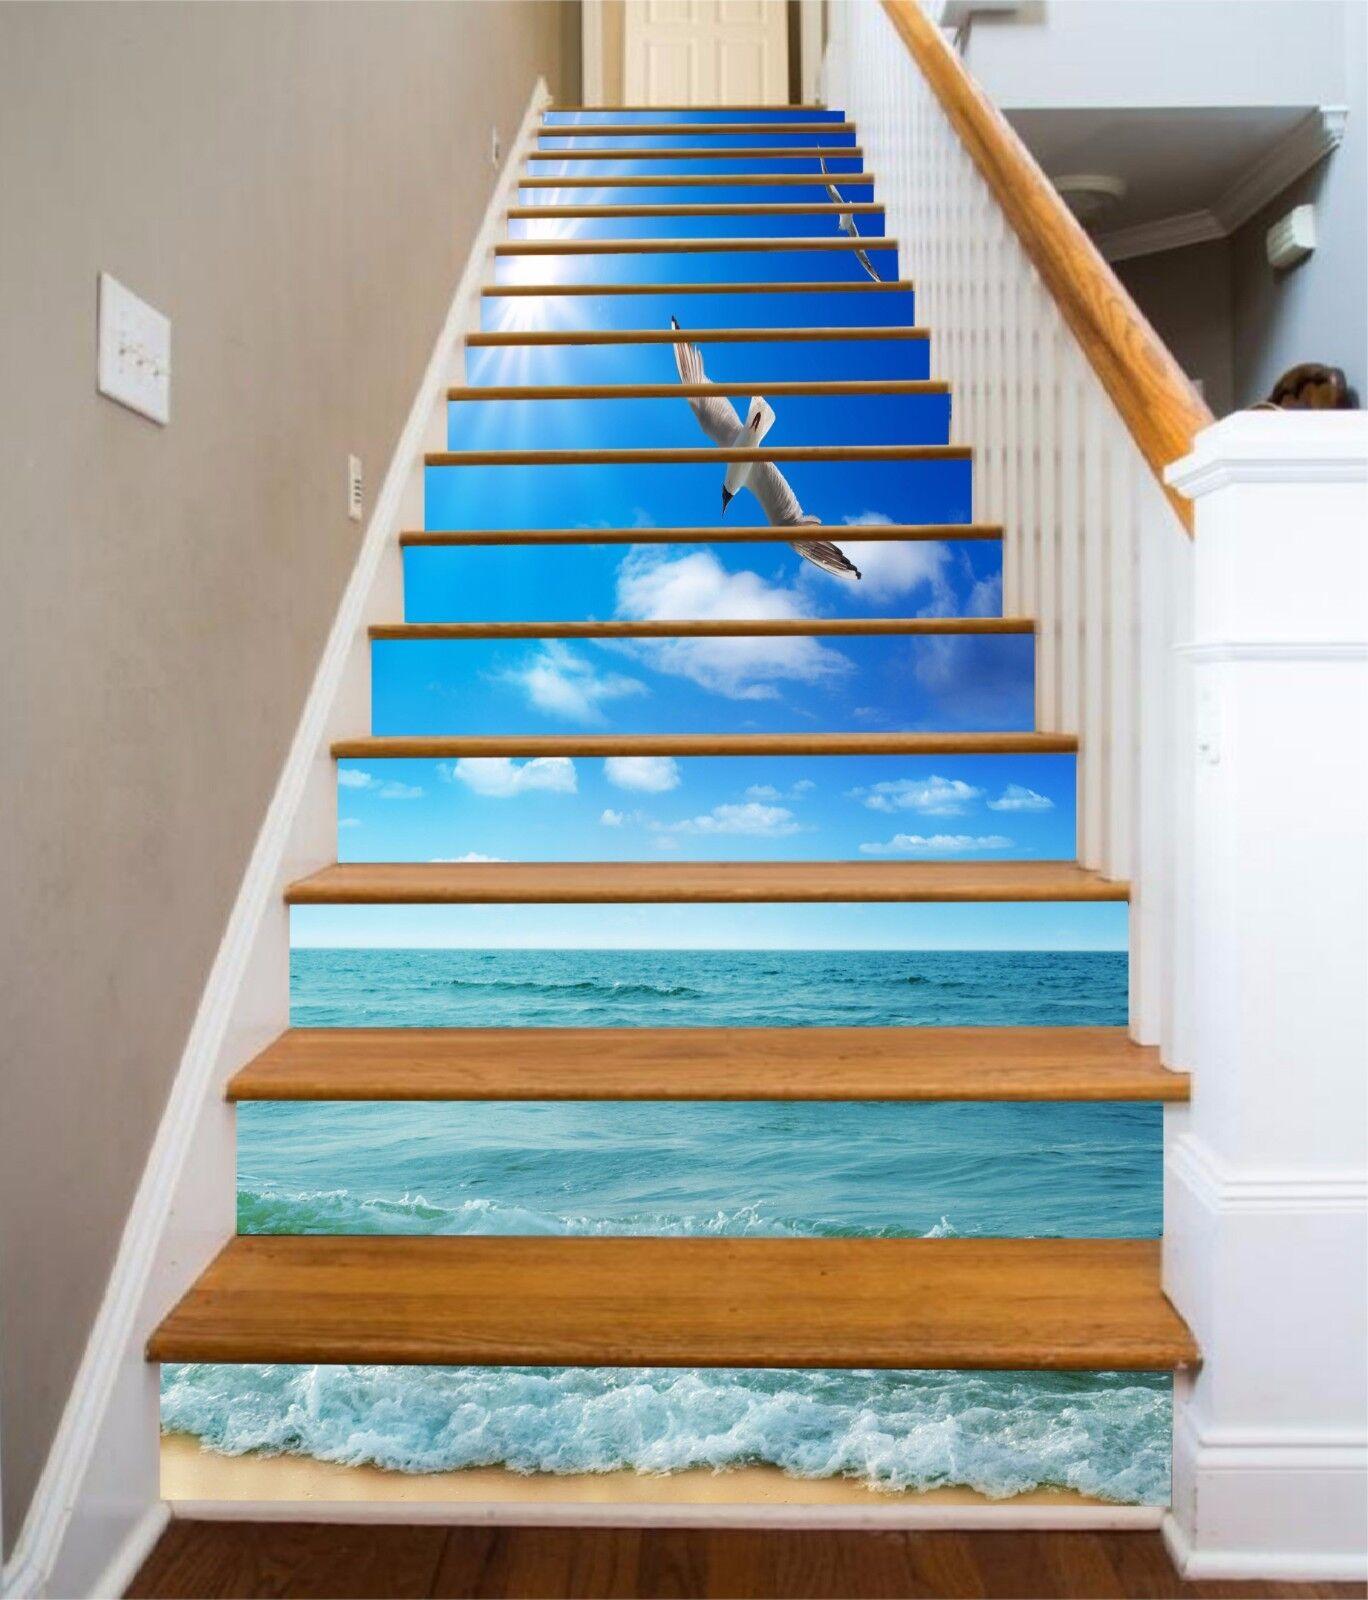 3D Seagulls Sea 862 Stair Risers Decoration Photo Mural Vinyl Decal Wallpaper AU